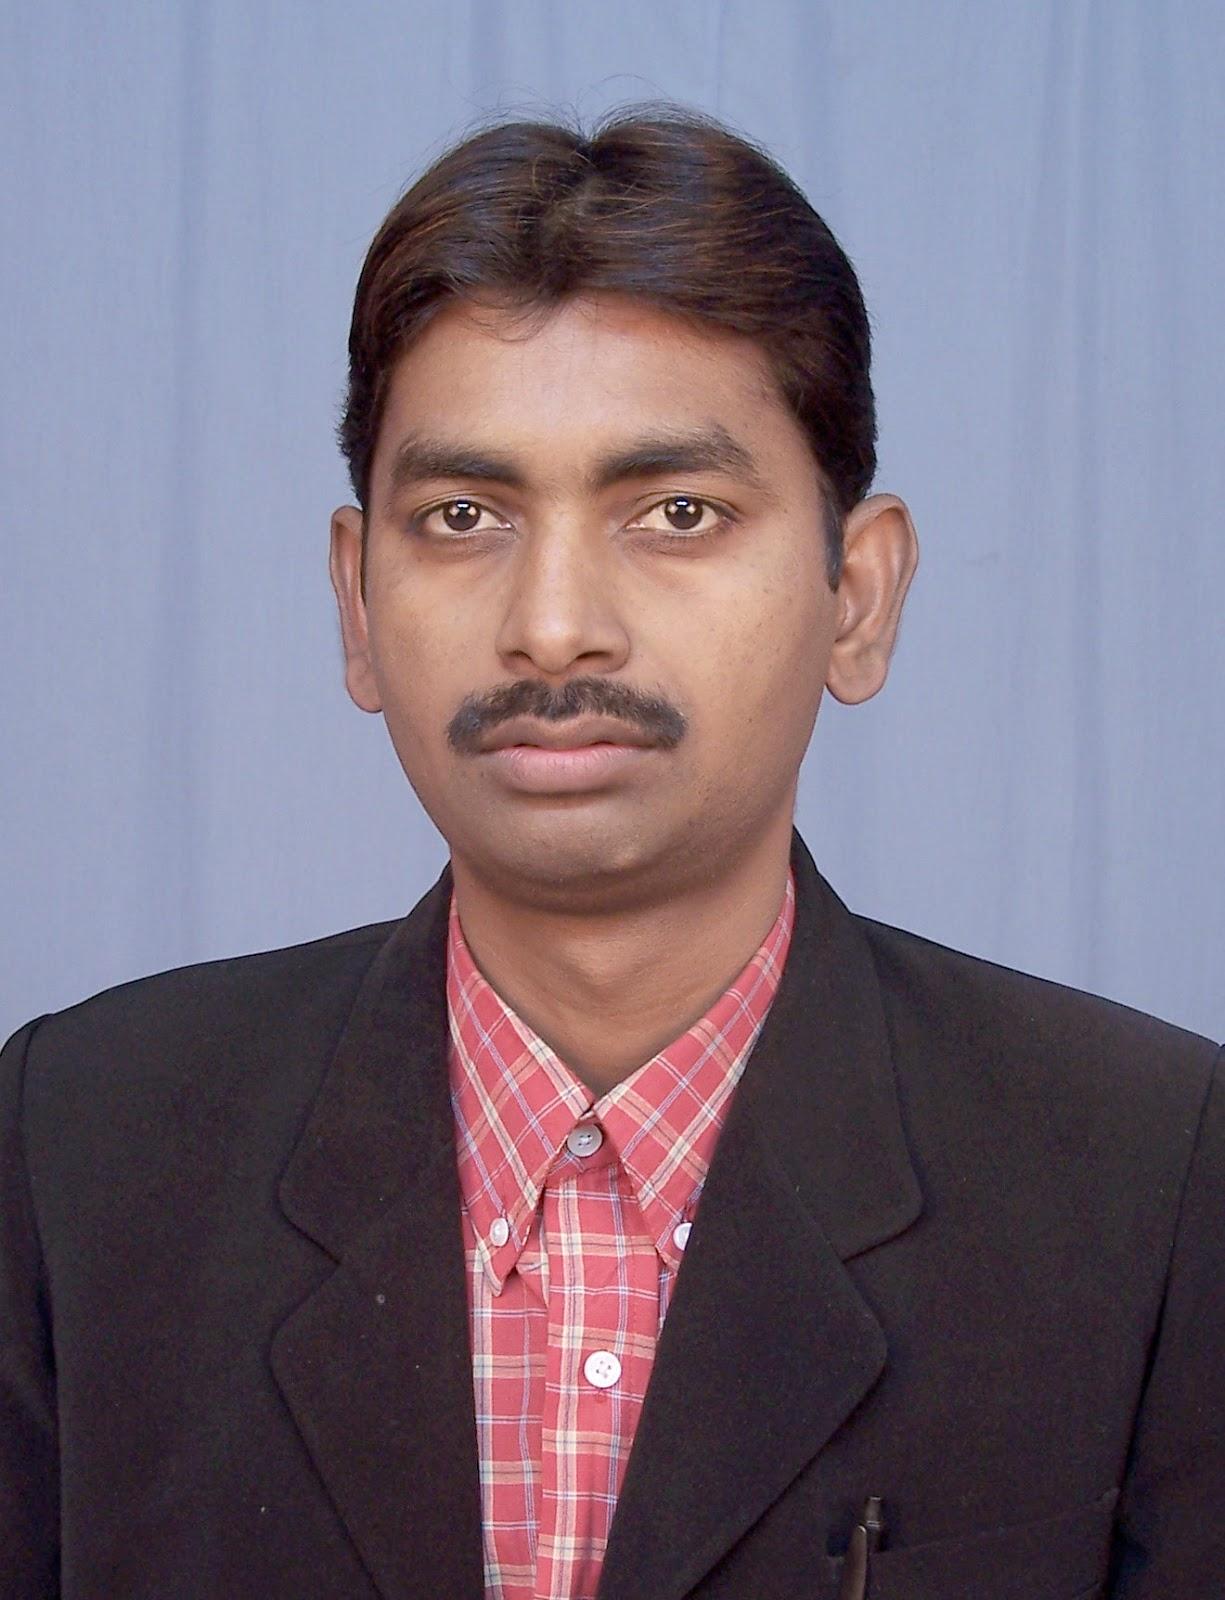 Dr. Zakir Ali Rajneesh - डॉ. जाकिर अली 'रजनीश'